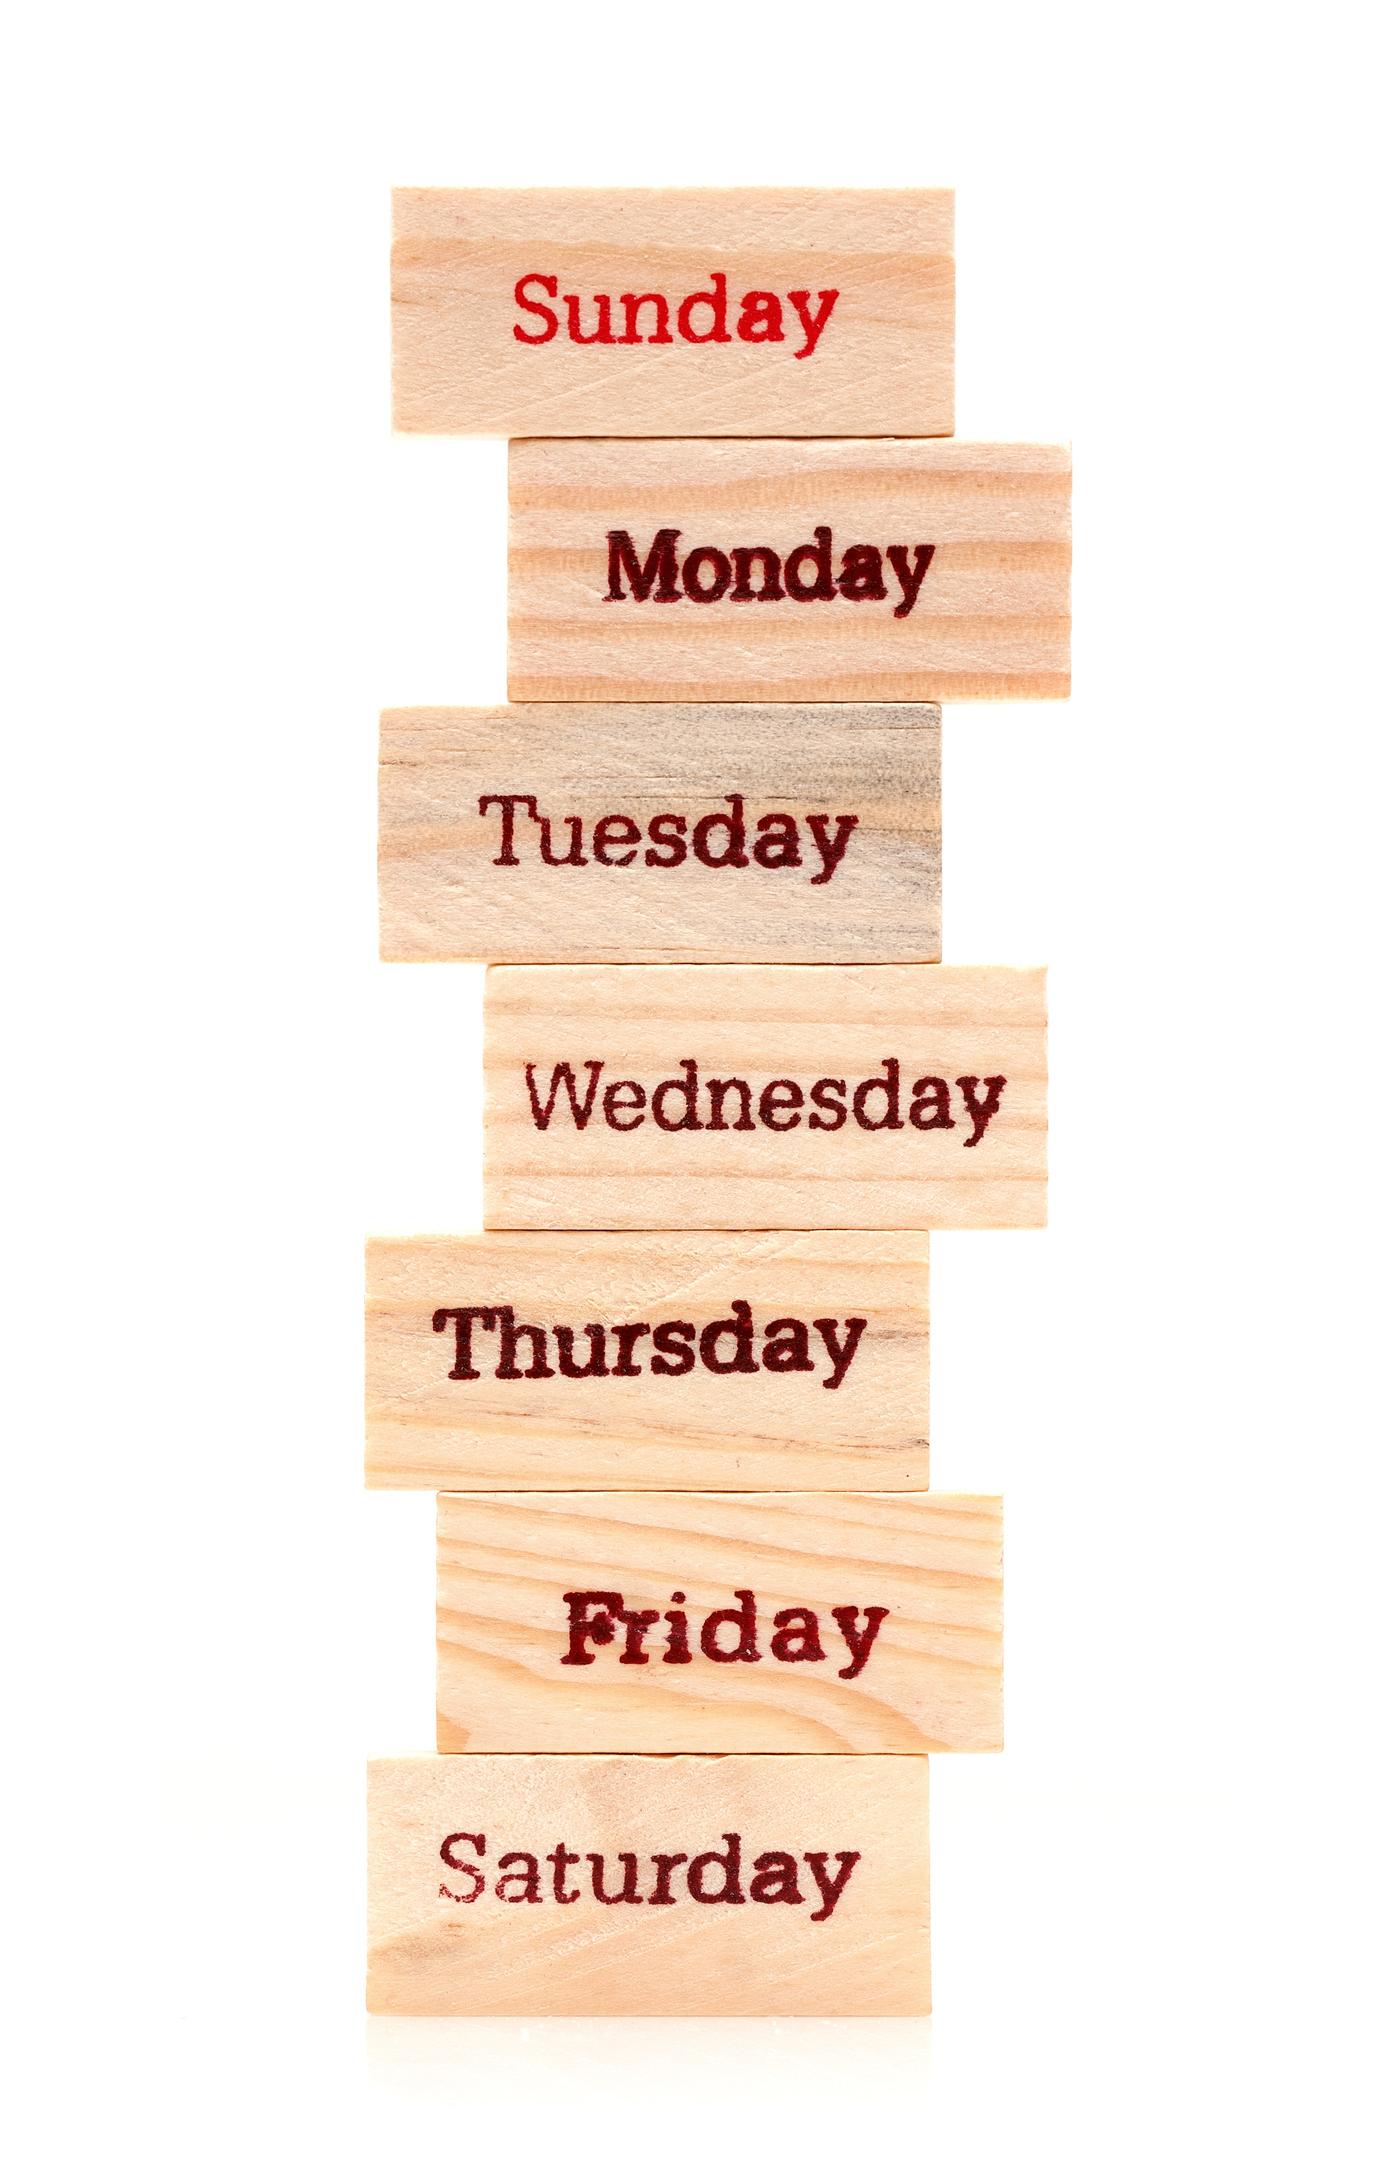 Days of week written on stacked blocks